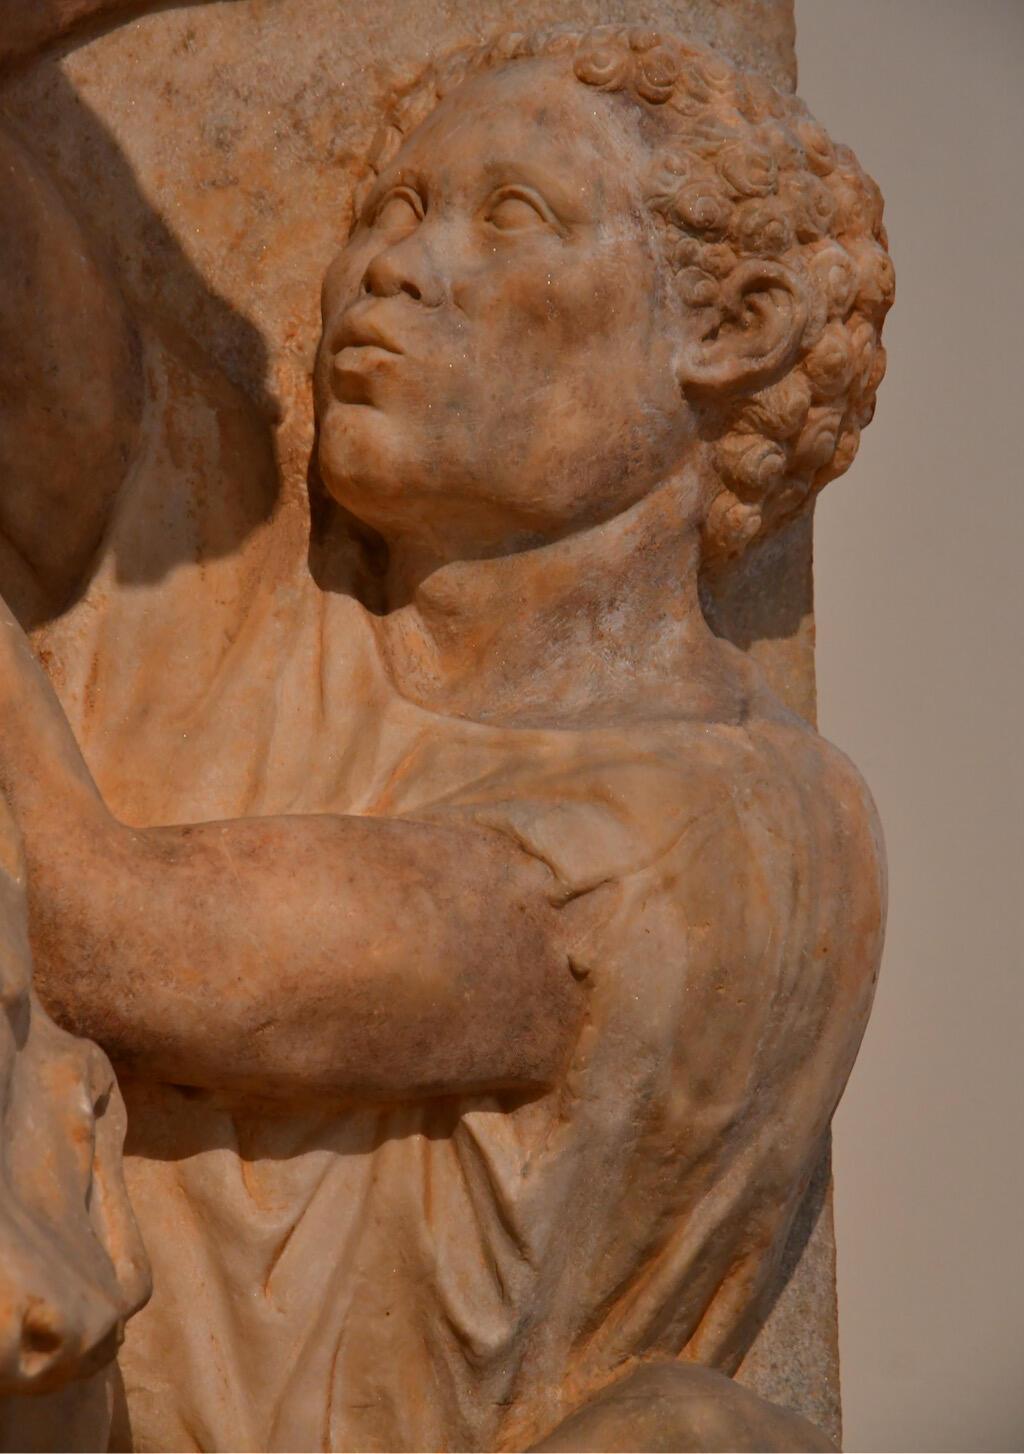 Relief sculpture of an African groom, ancient Greece